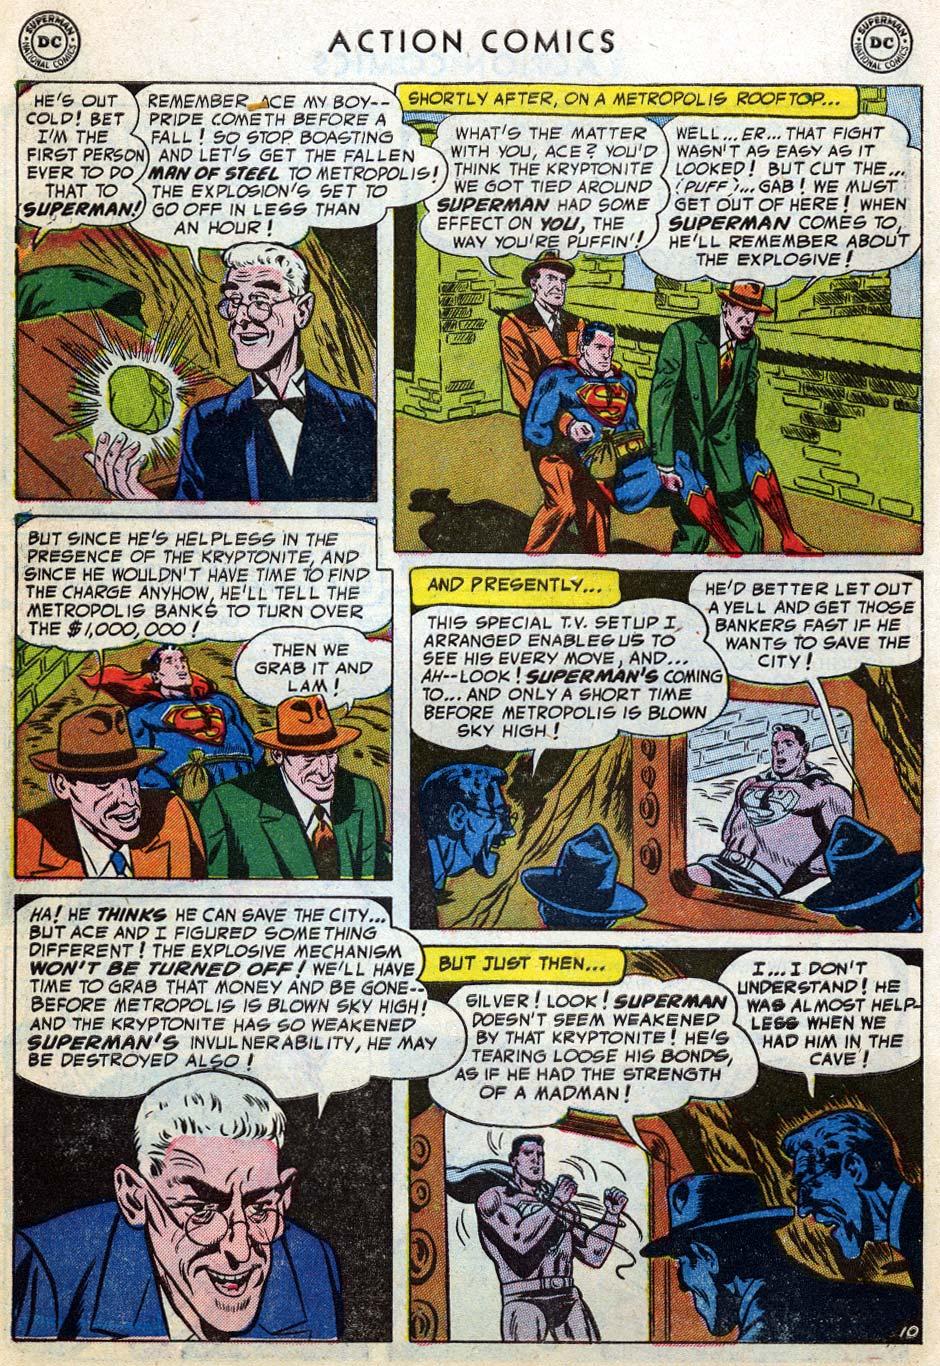 Action Comics (1938) 187 Page 11